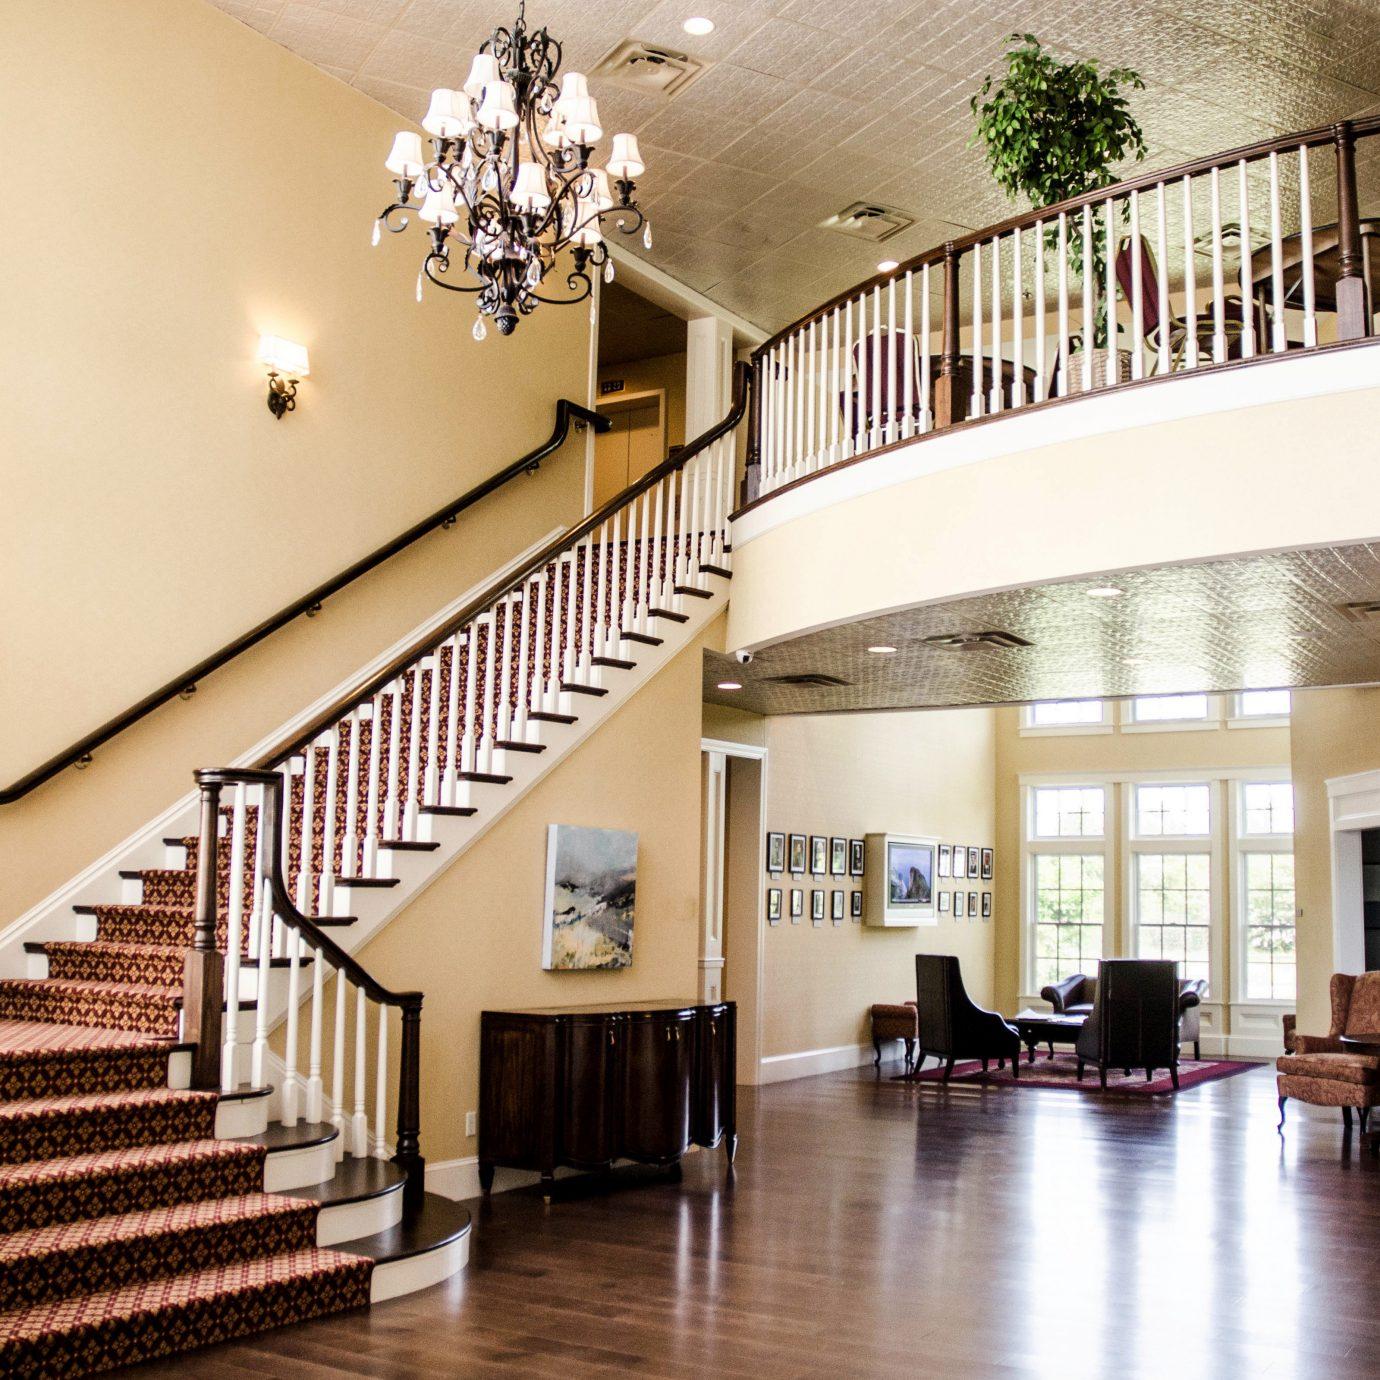 B&B Boutique Historic Lobby Romantic property hall condominium stairs